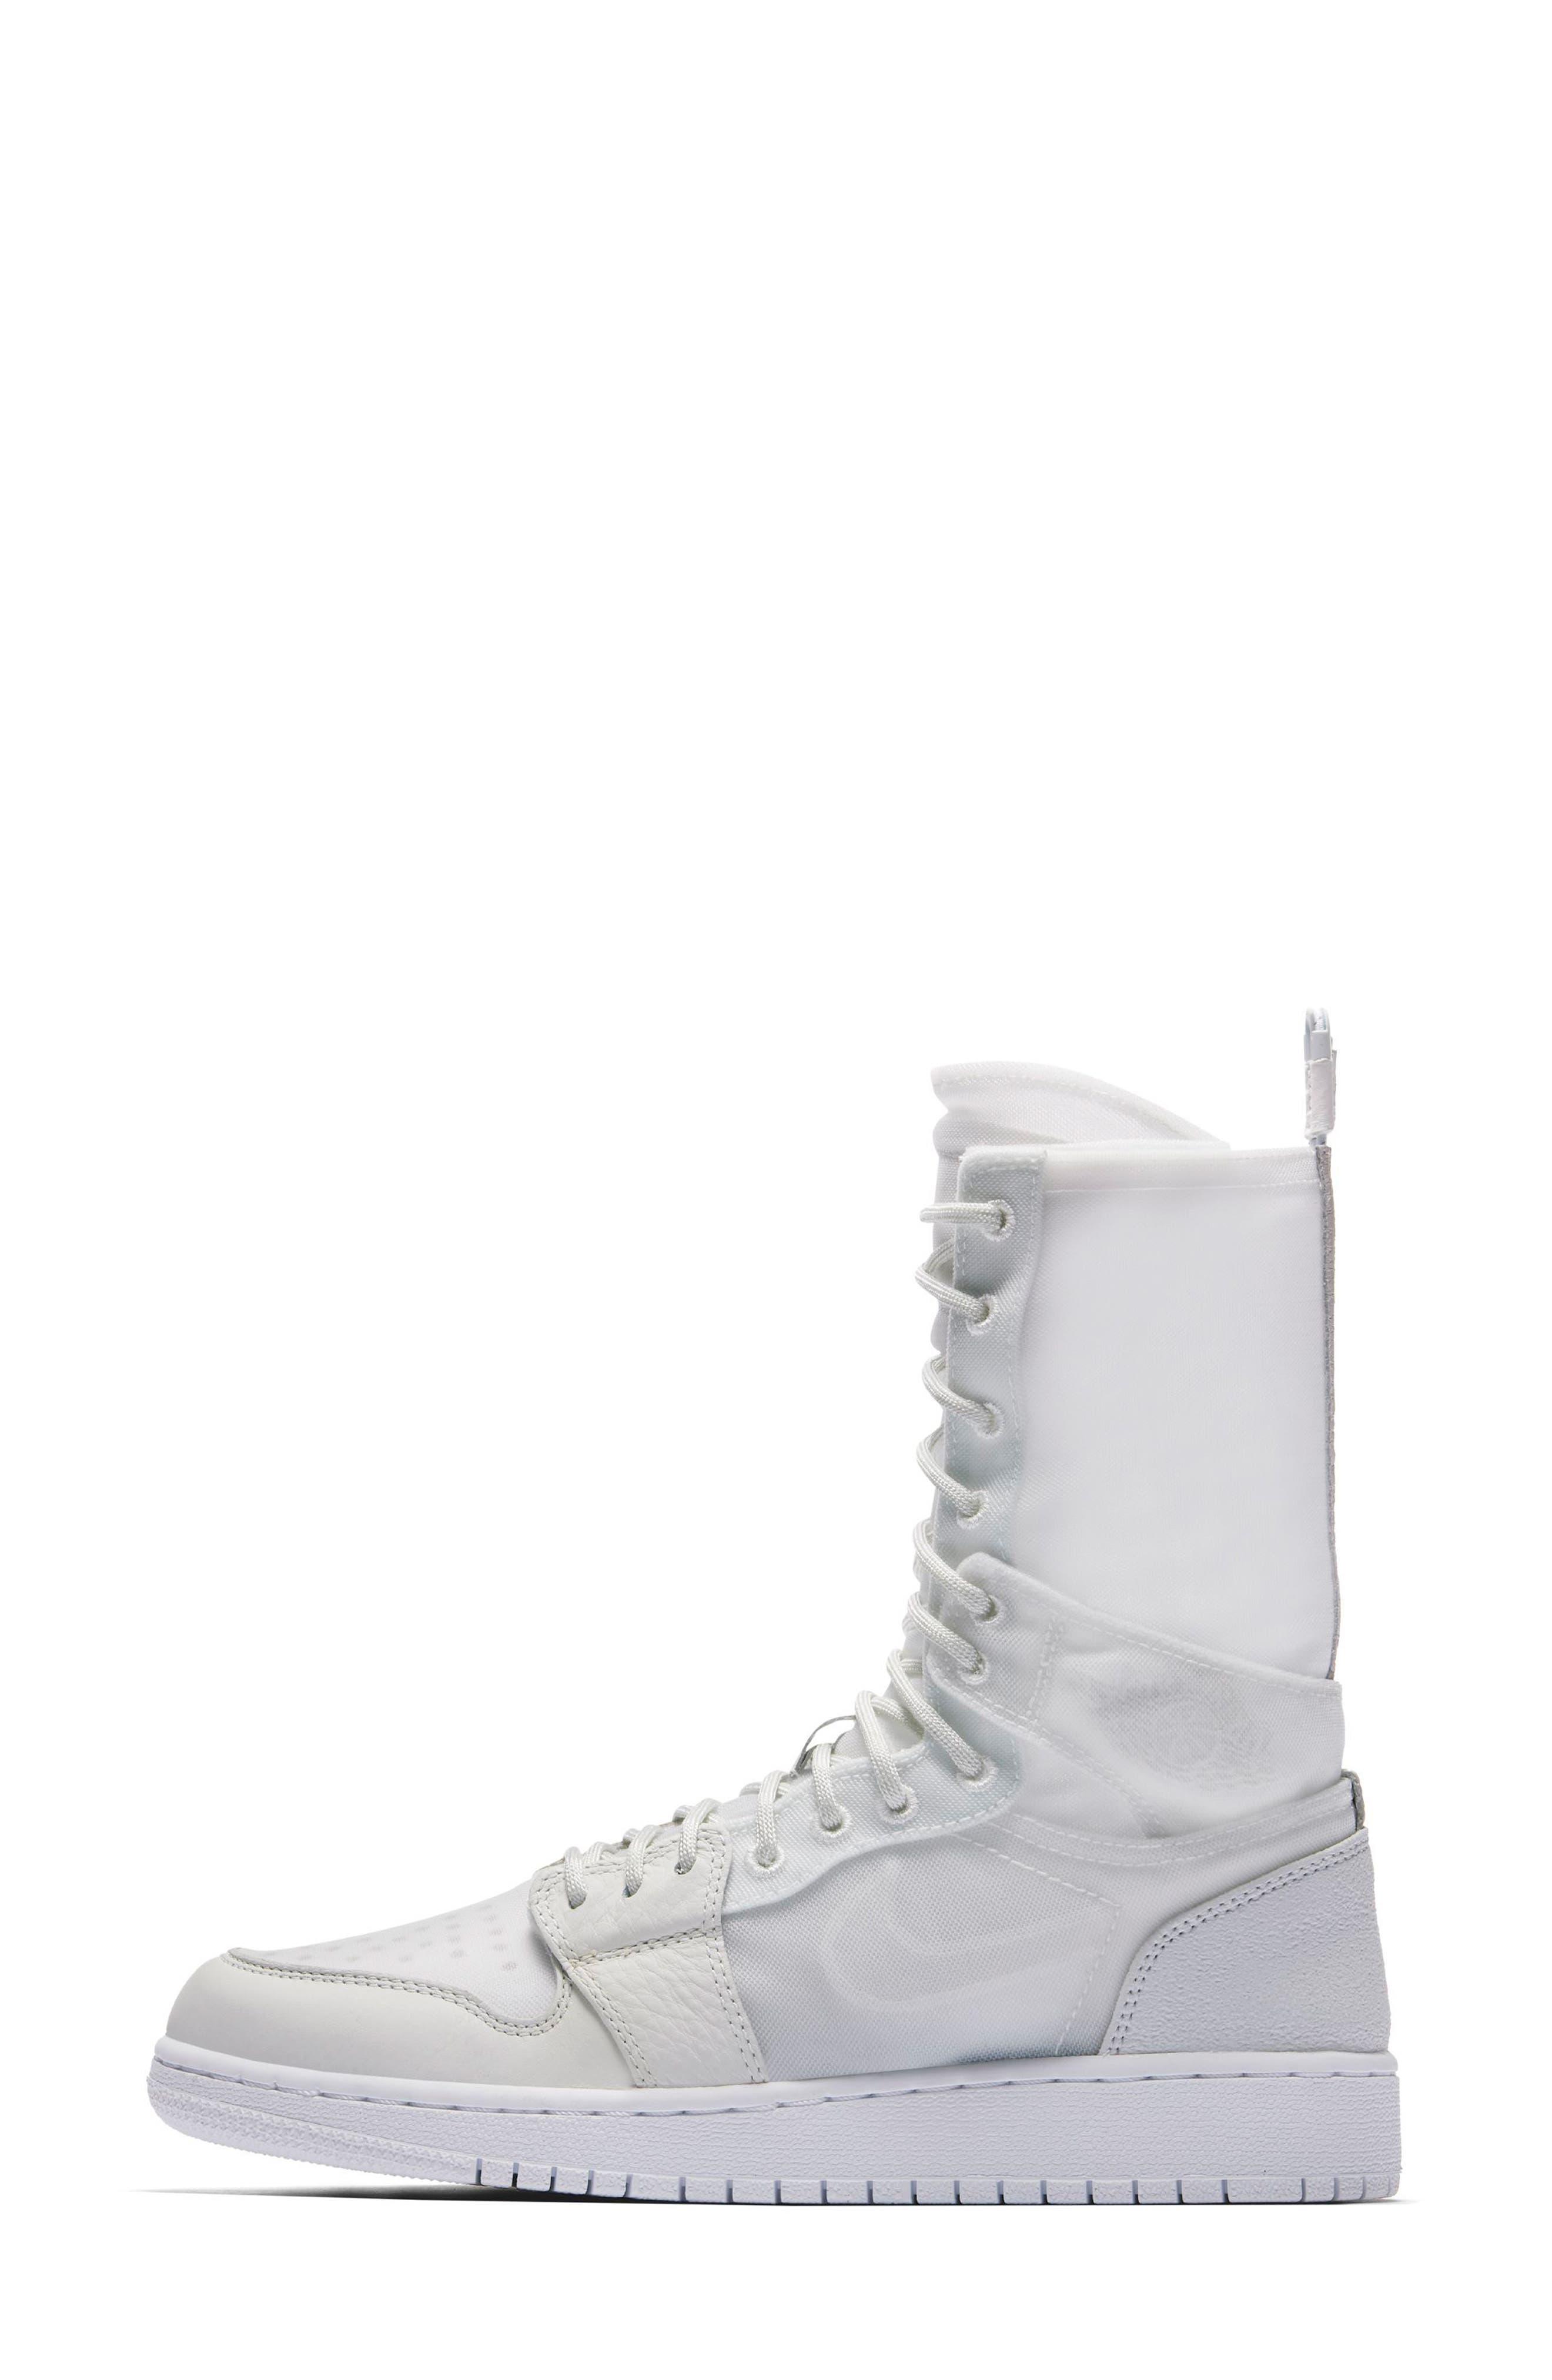 Air Jordan 1 Explorer XX Convertible High Top Sneaker,                             Alternate thumbnail 3, color,                             Off White/ Off White